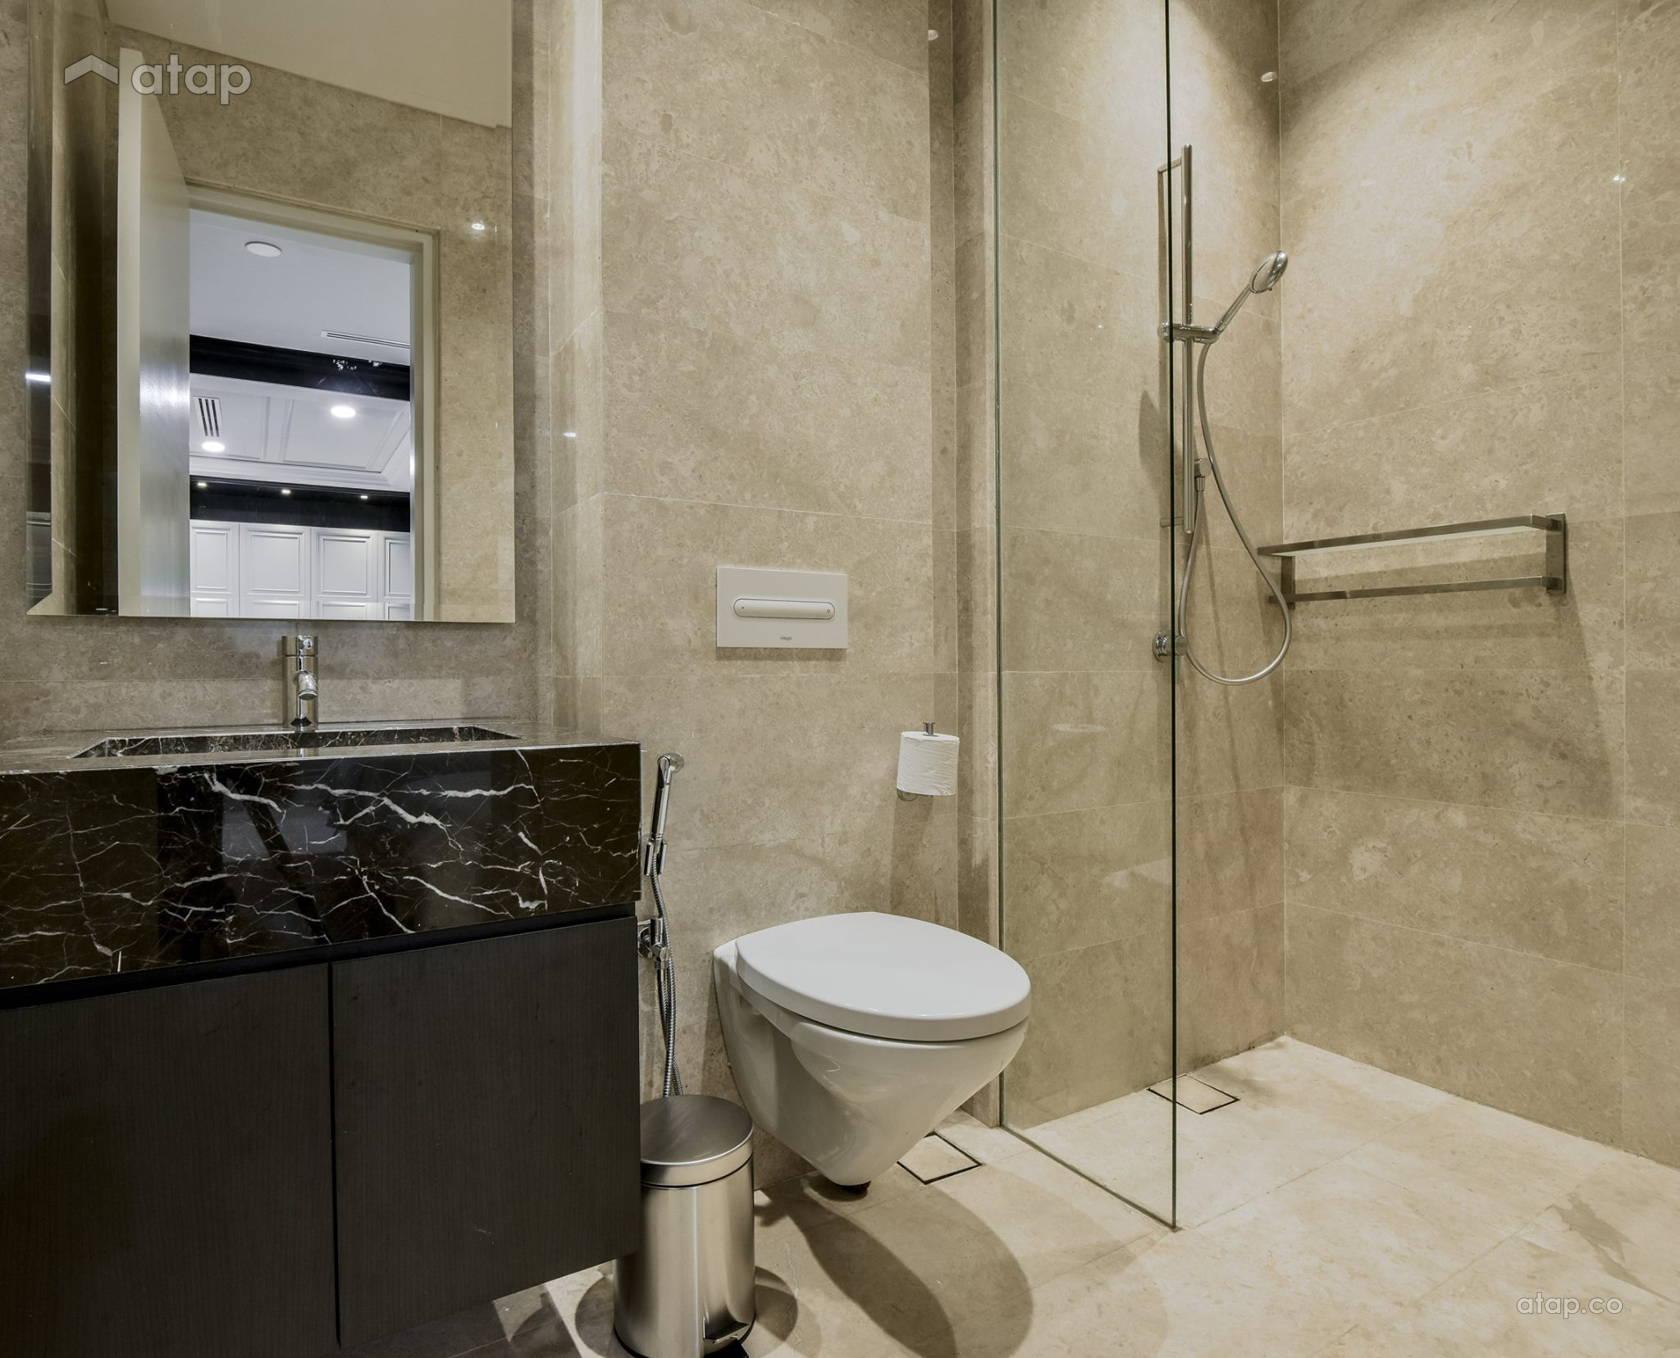 Classic Modern Bathroom Condominium Design Ideas Photos Malaysia Atap Co,Types Of House Interior Designs